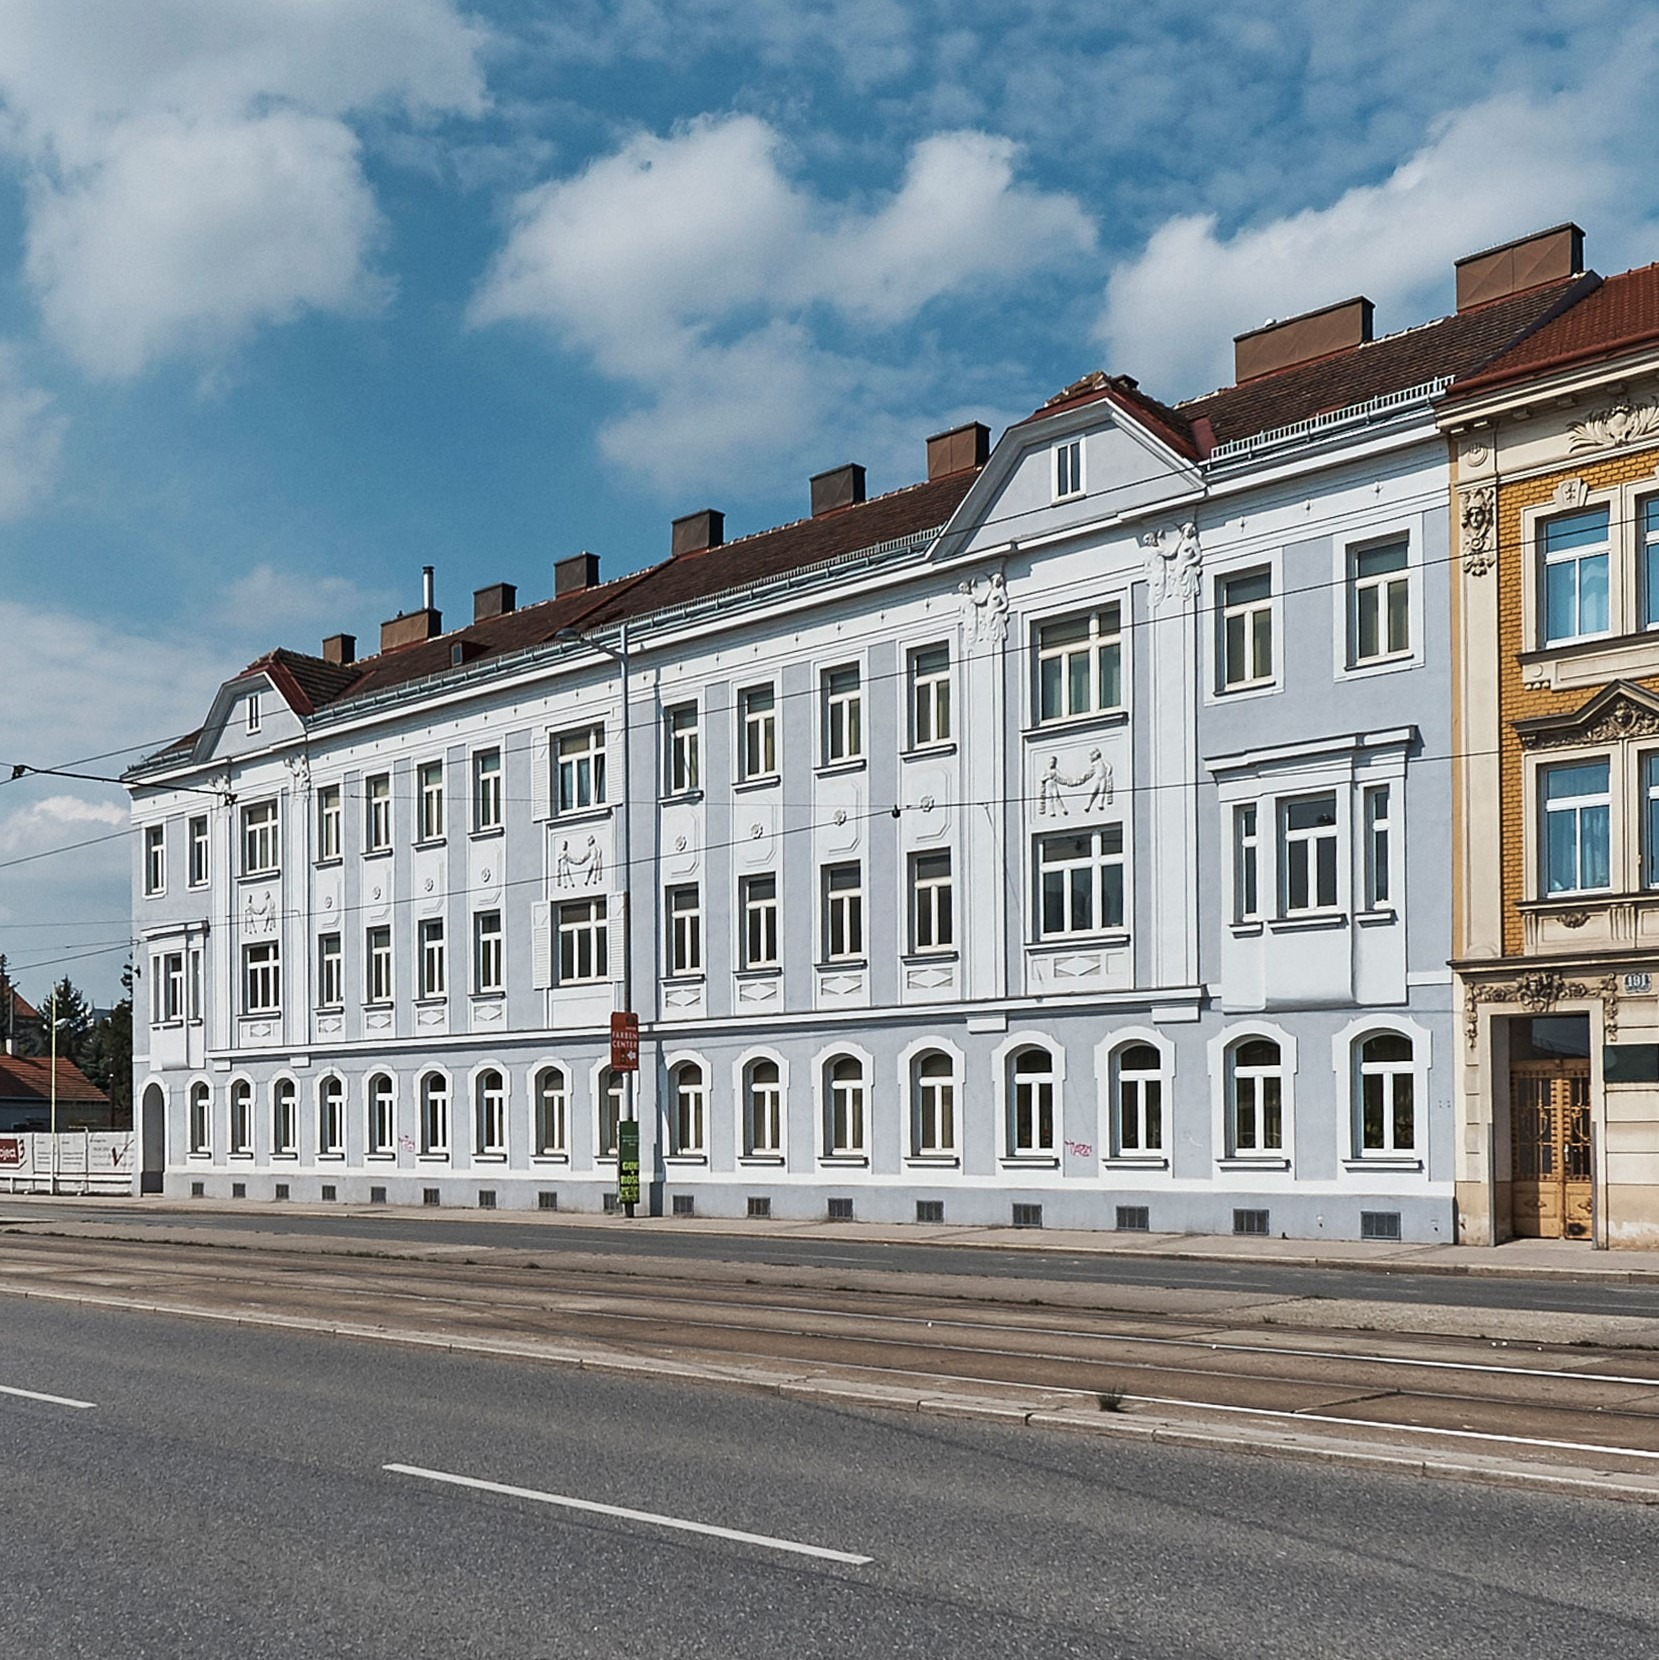 2021 1210 Brünner Straße